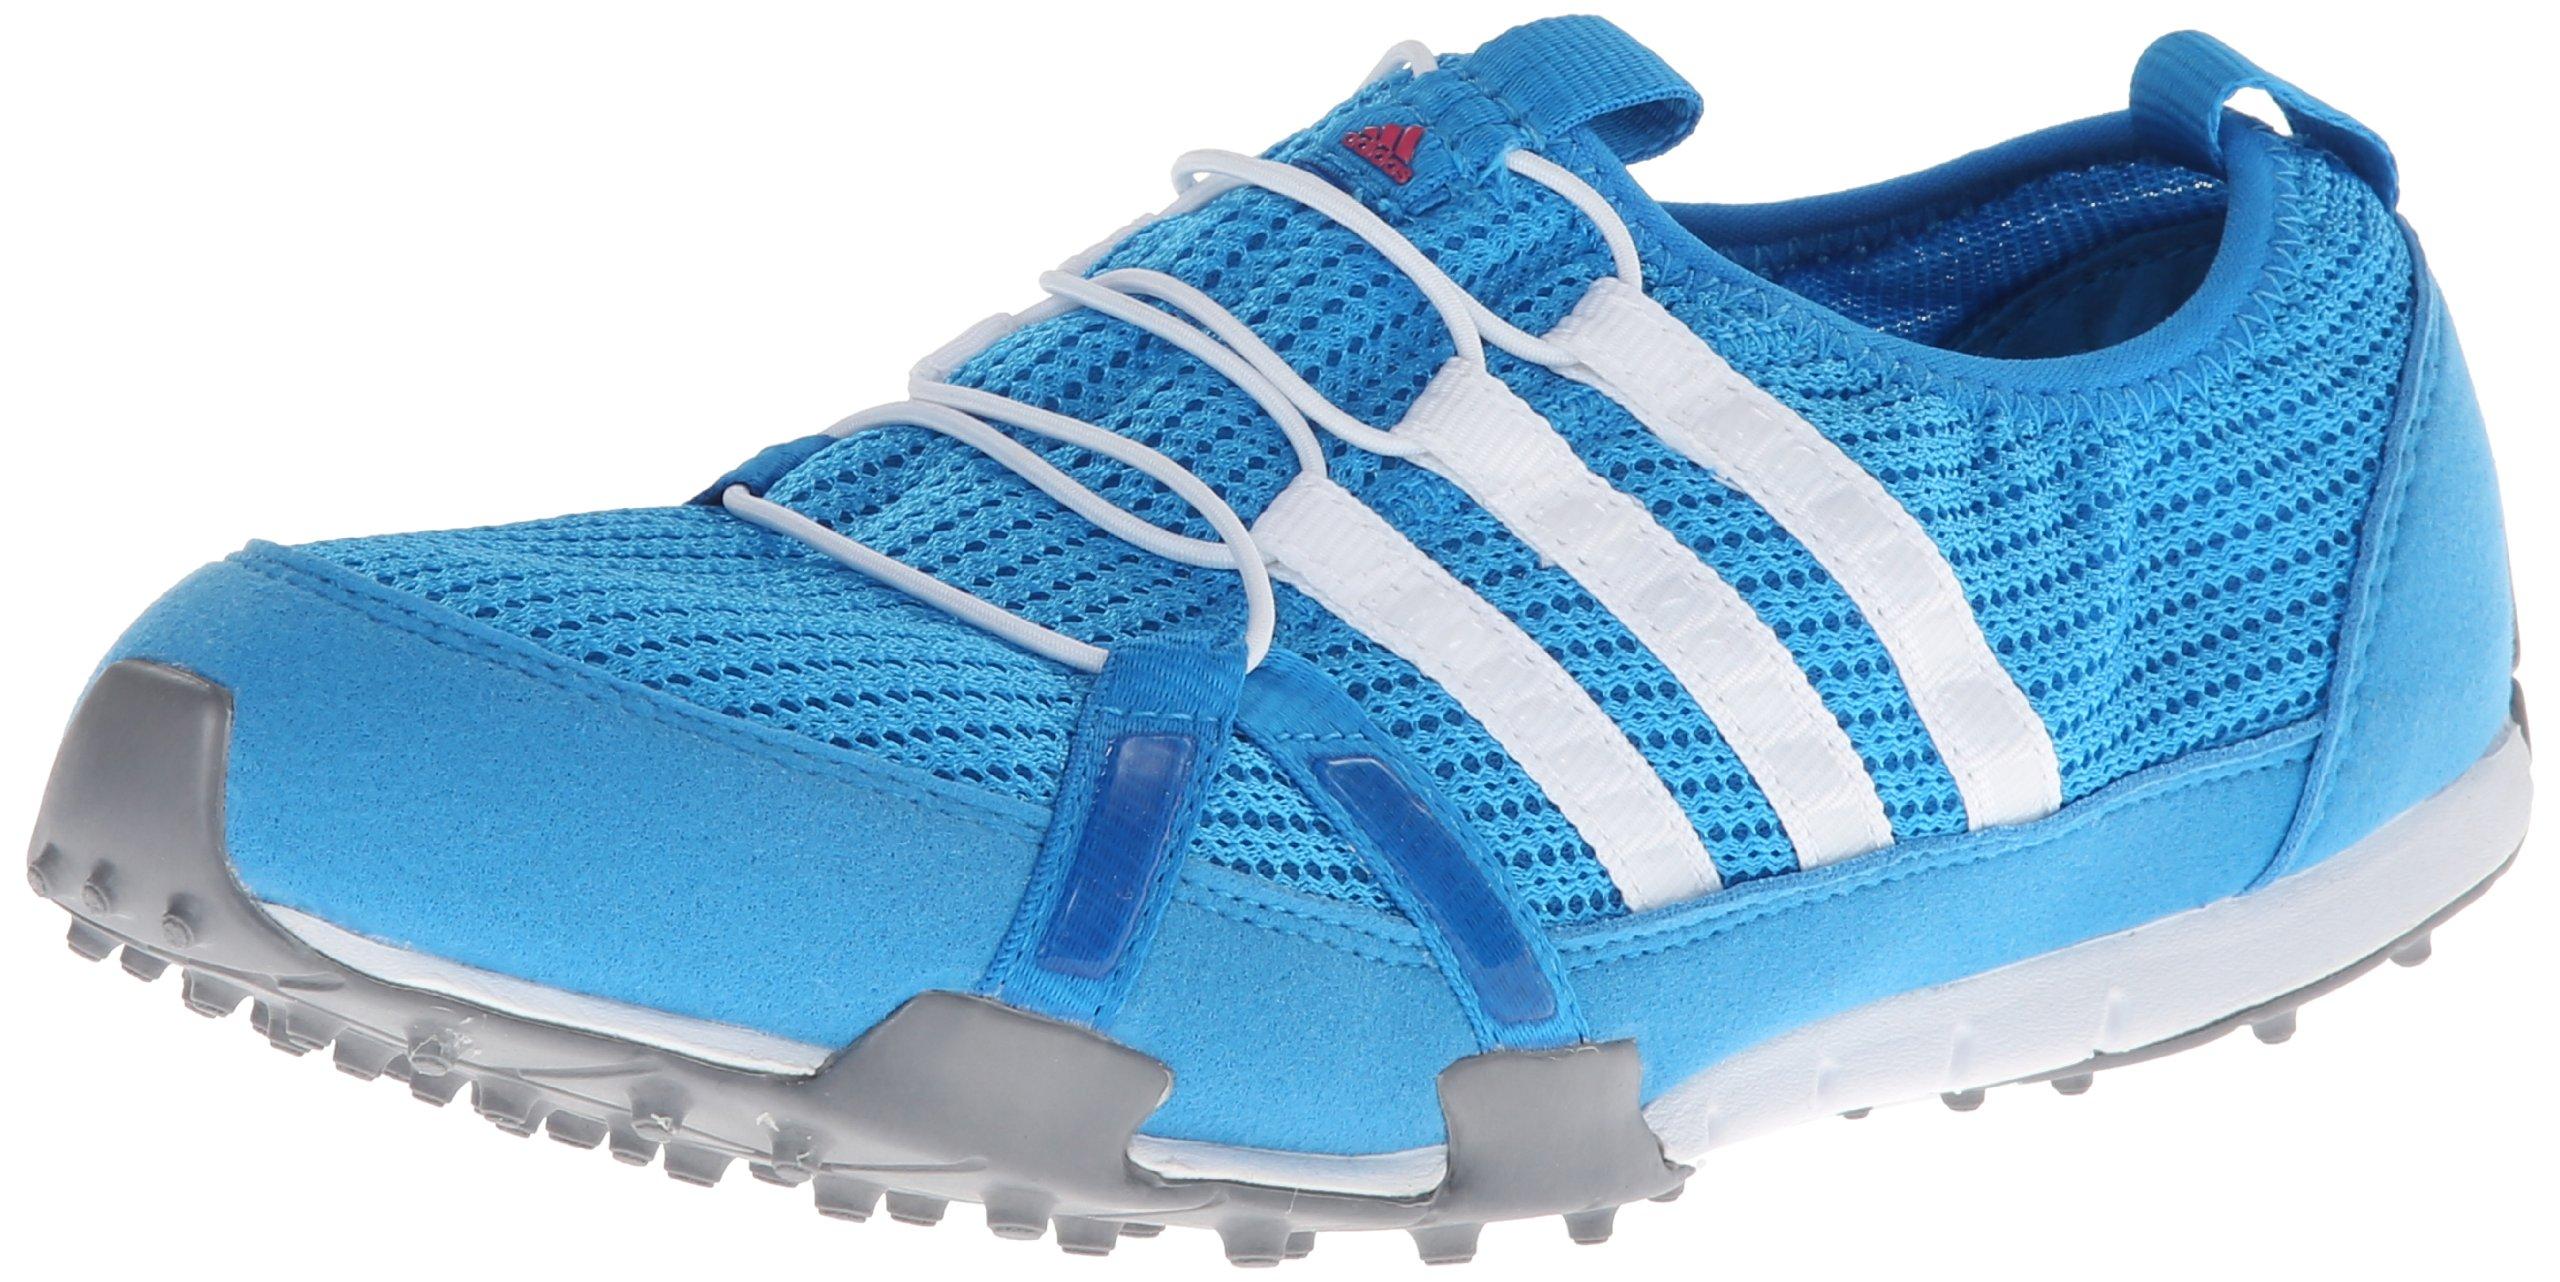 adidas Women's Climacool Ballerina Golf Shoe,Solar Blue/White/Metallic Silver,8 M US